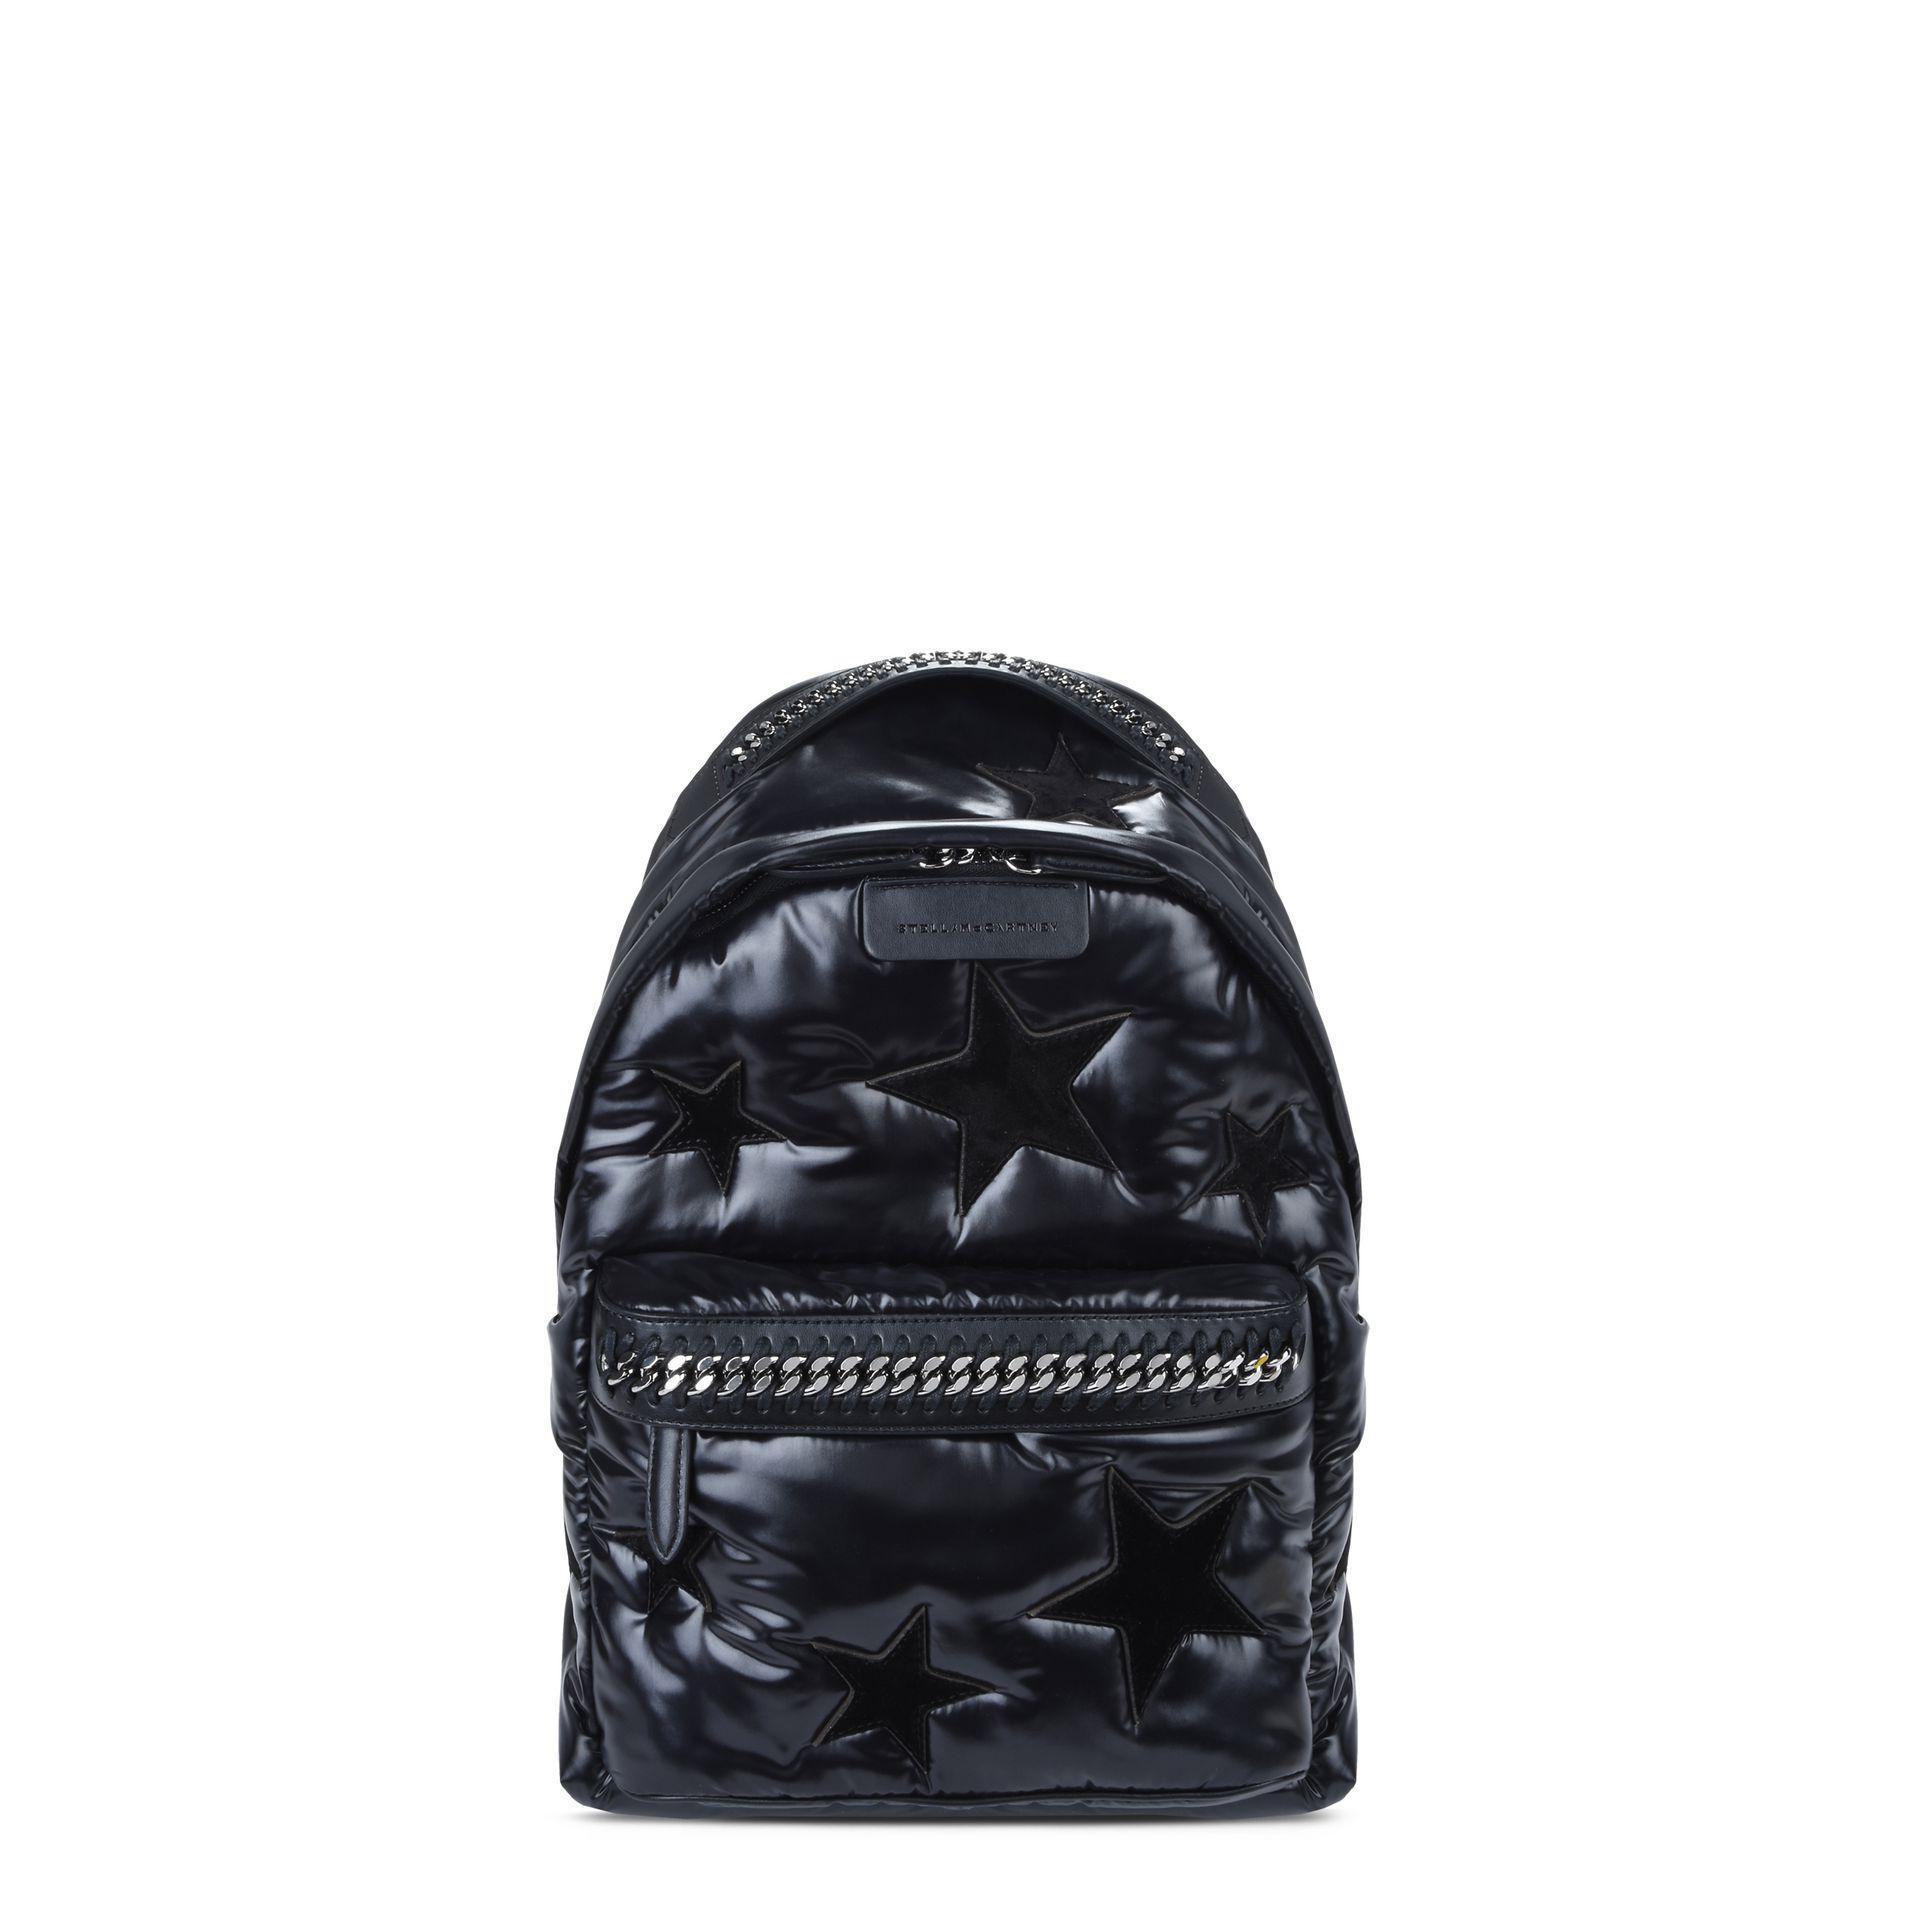 bff110ec1447 Stella Mccartney Black Stars Falabella Go Backpack in Black - Lyst